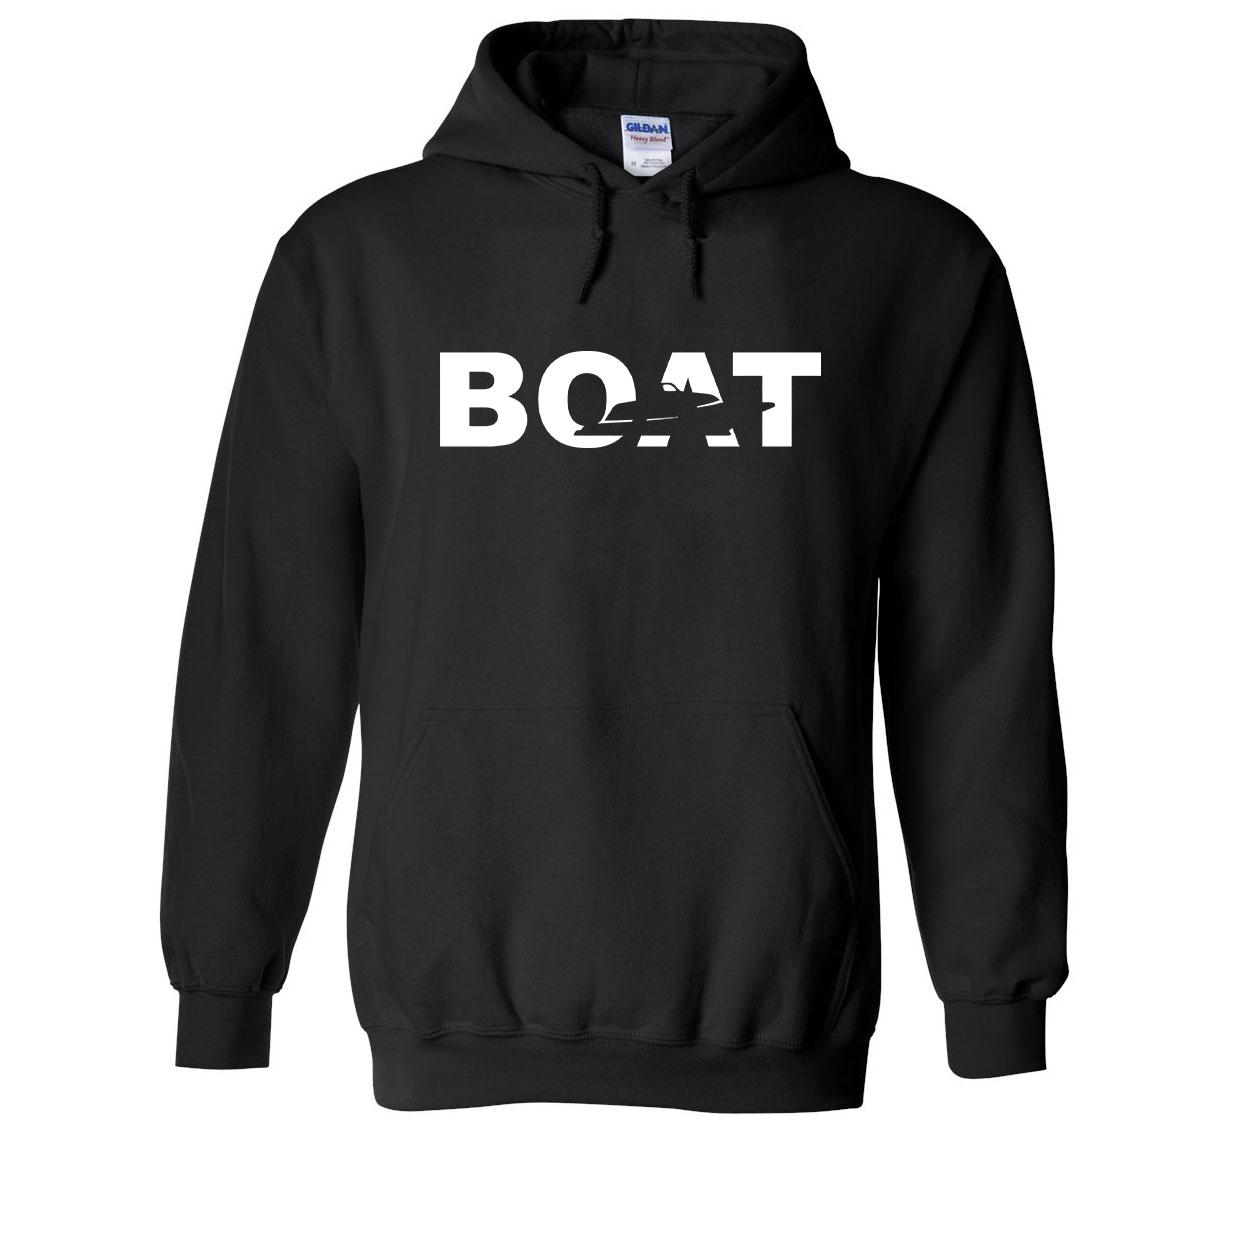 Boat Yacht Logo Classic Sweatshirt Black (White Logo)